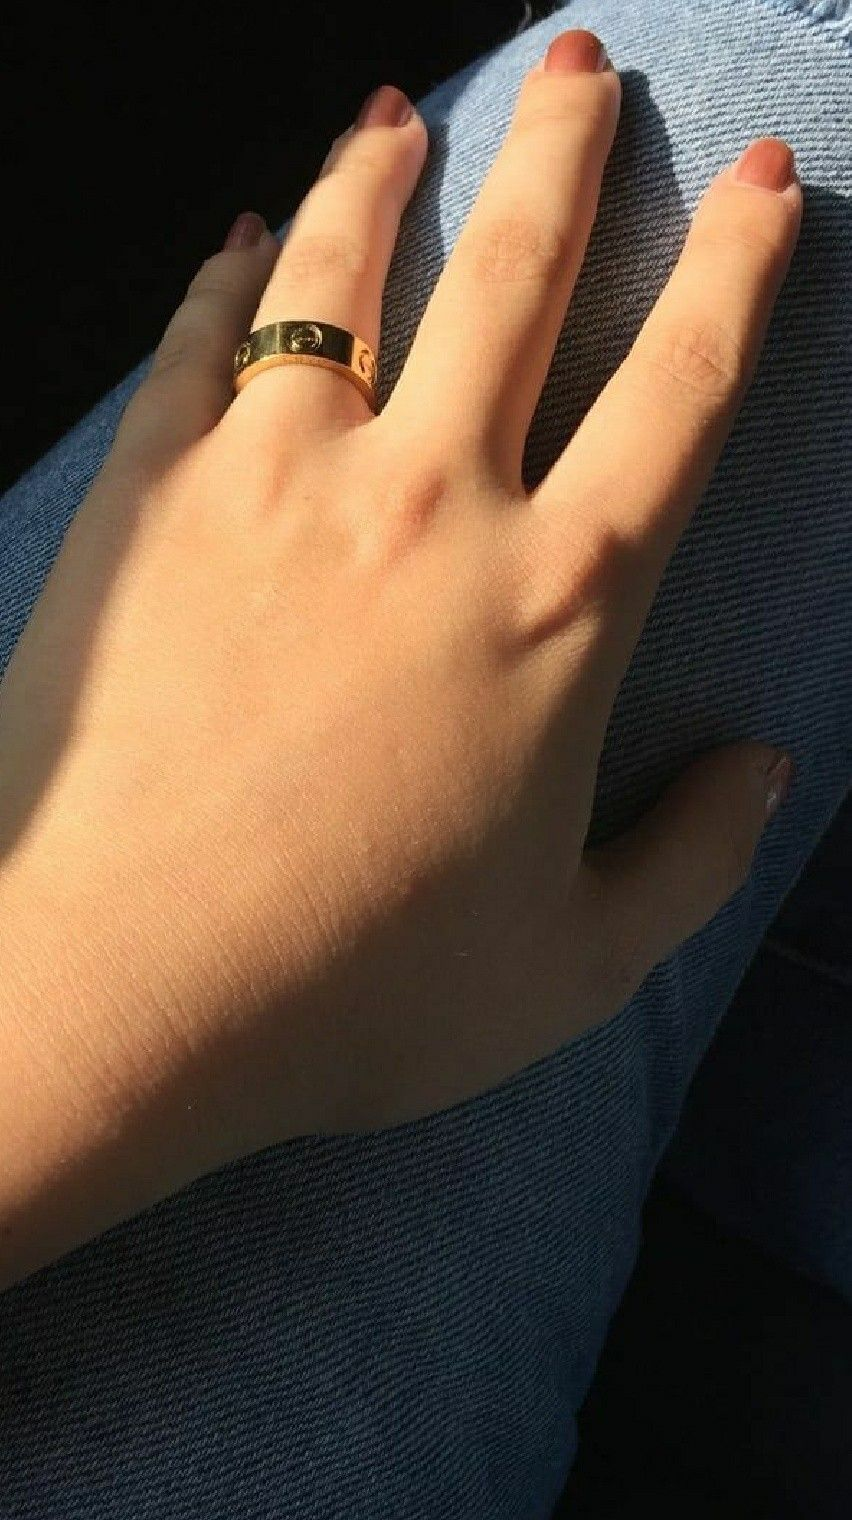 Love Rings Couple Rings in 2020 Cartier wedding rings